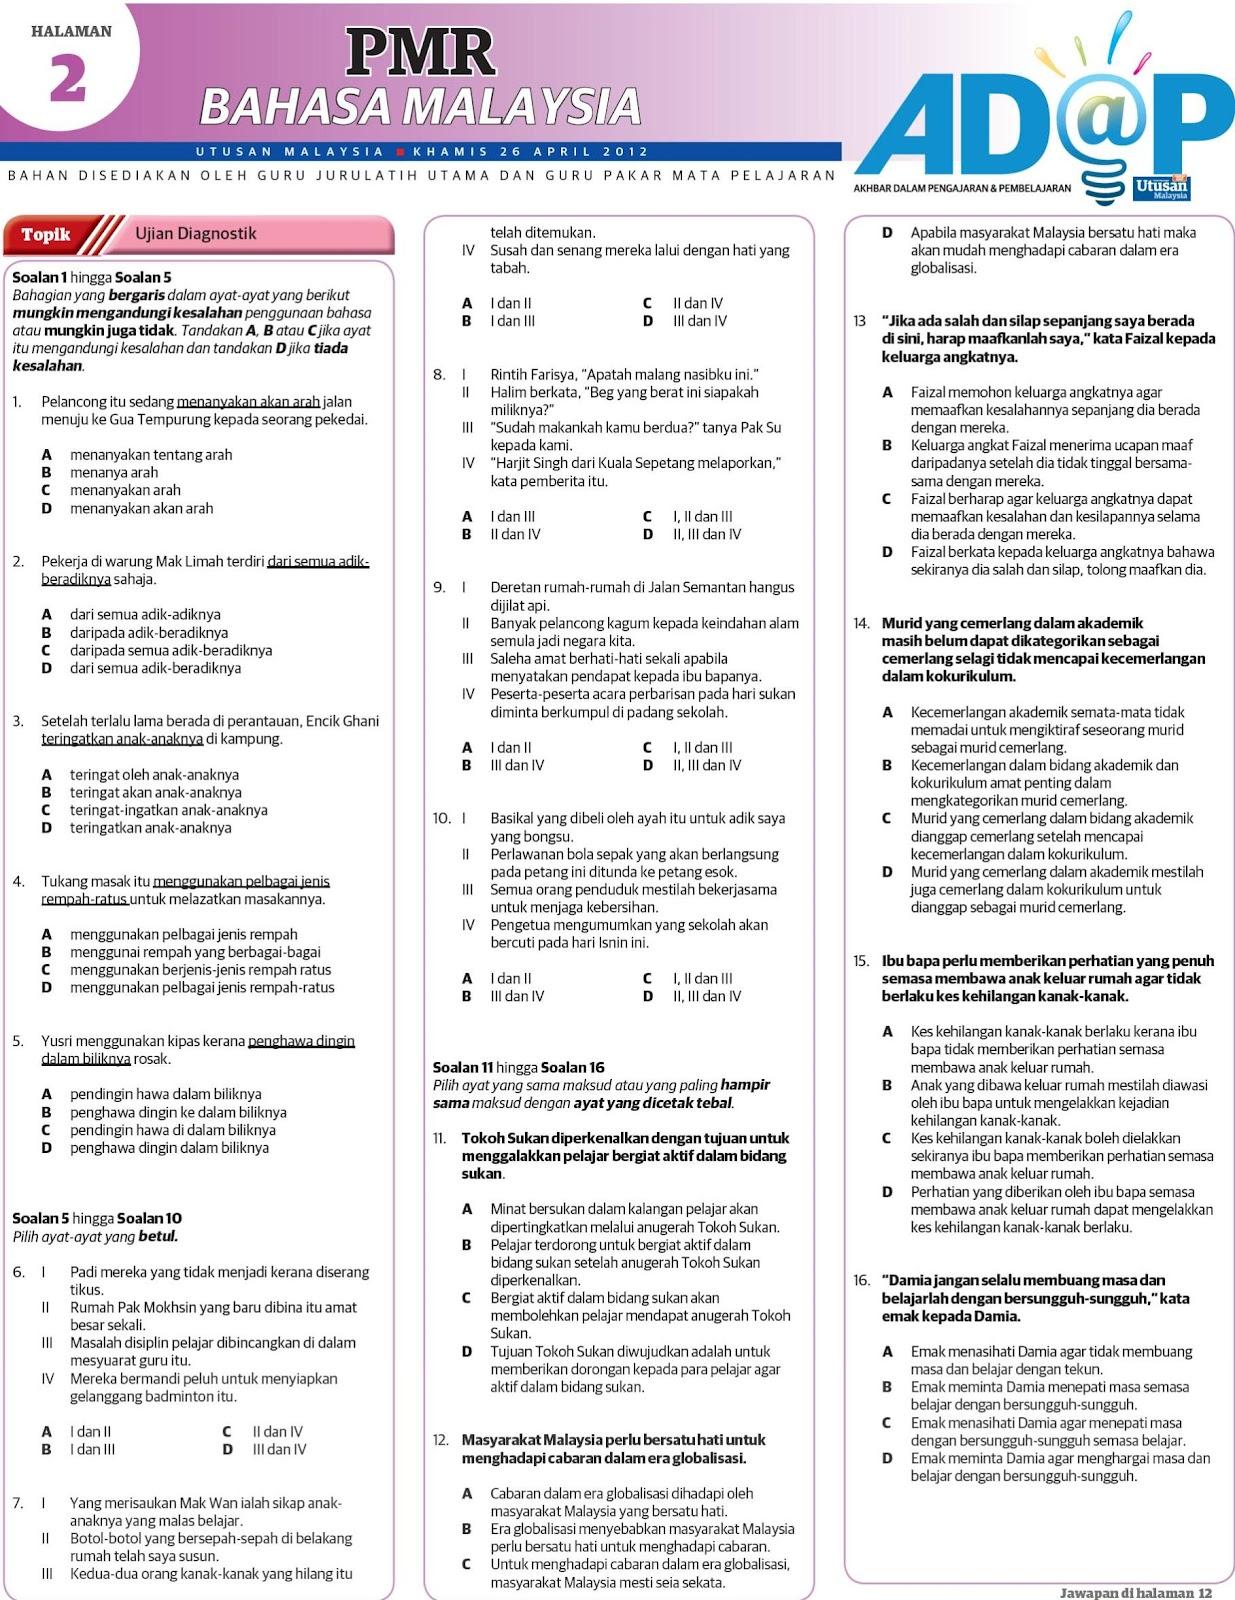 Bahasa Malaysia PMR